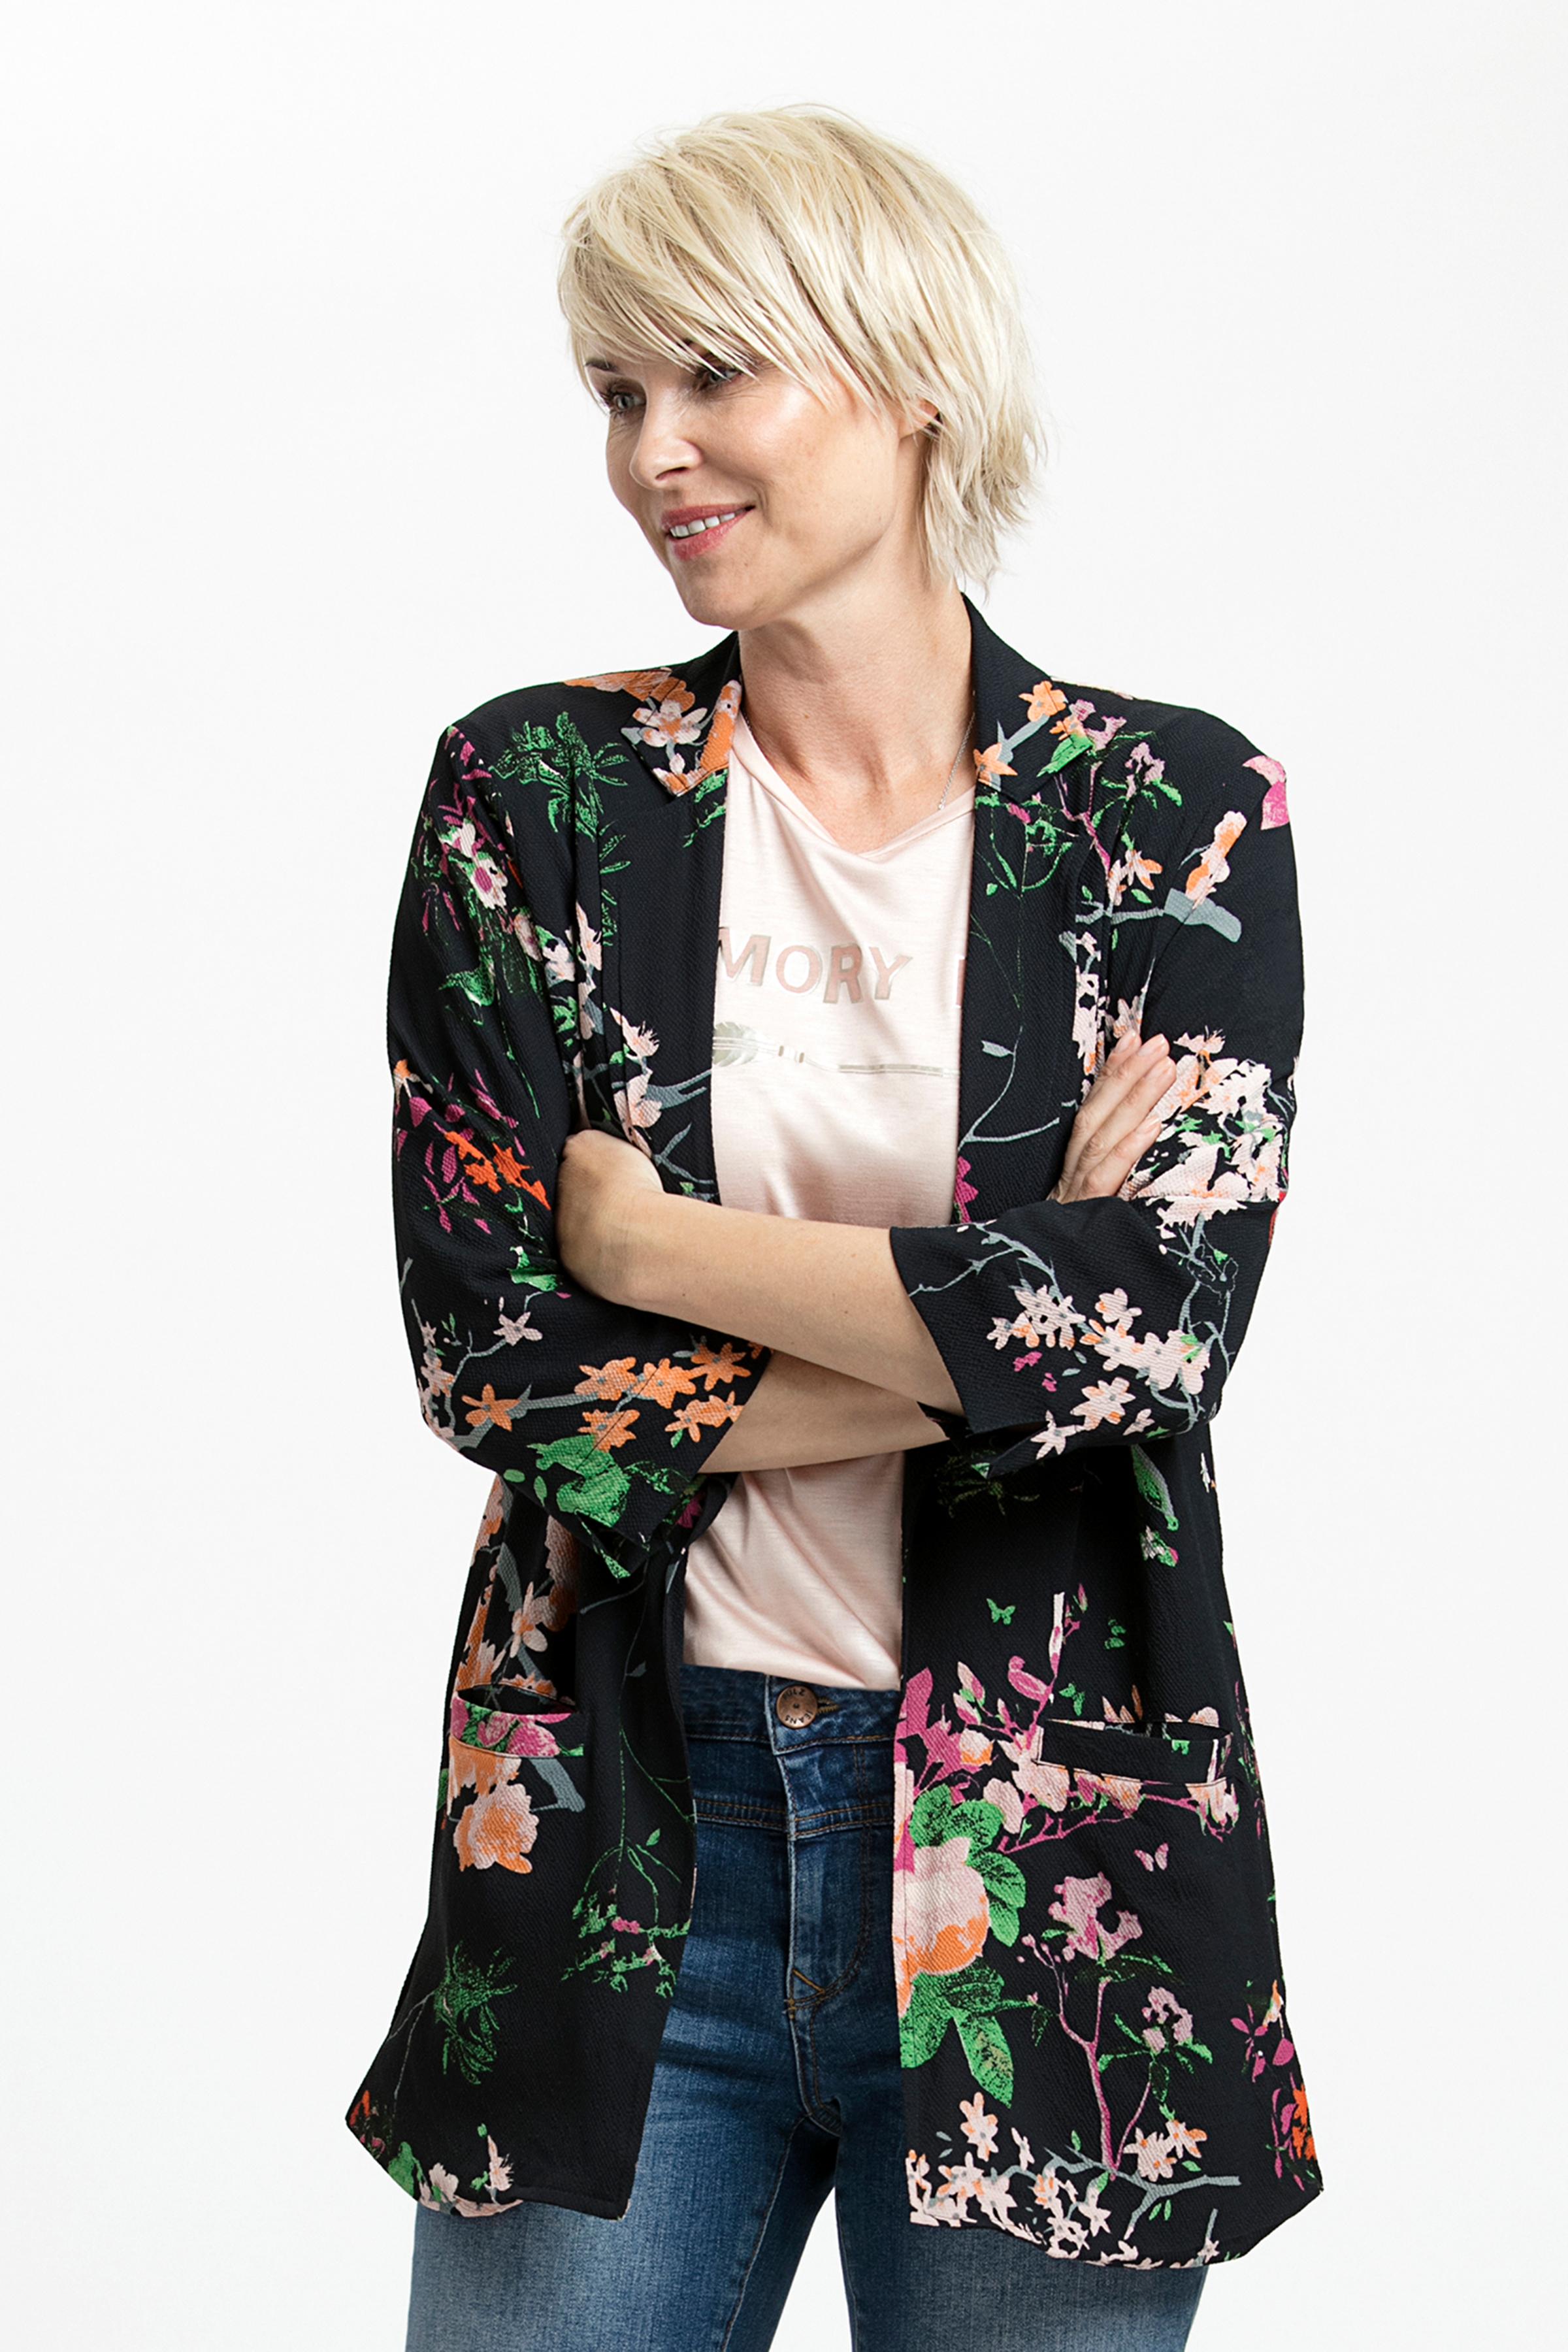 Marineblau/rosa Jacken von Kaffe – Shoppen SieMarineblau/rosa Jacken ab Gr. 34-46 hier